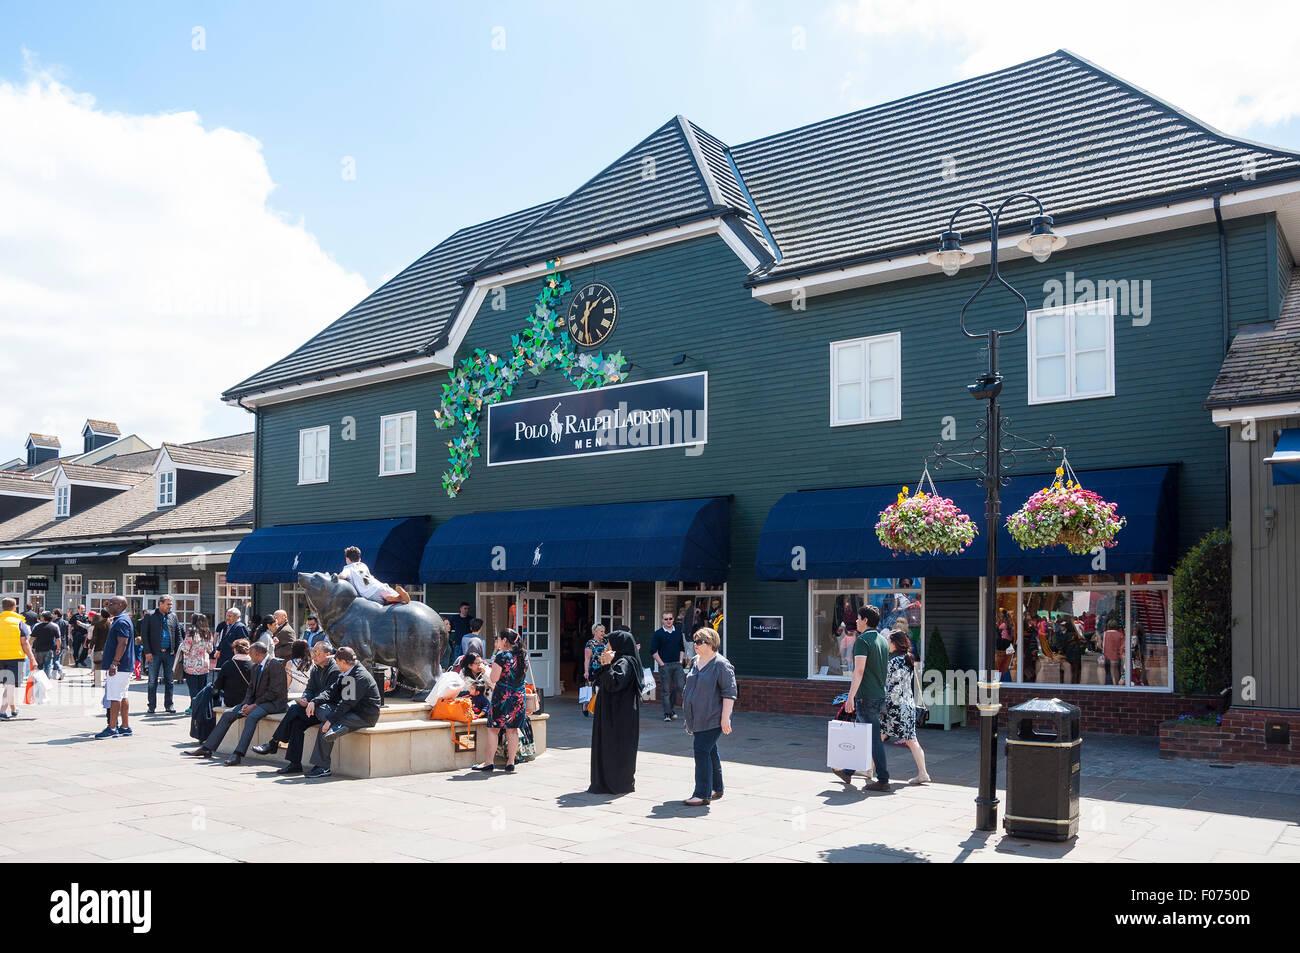 Polo Ralph Lauren Designer store am Bicester Village Outlet Shopping  Centre, Bicester, Oxfordshire, 7da4bc44c2